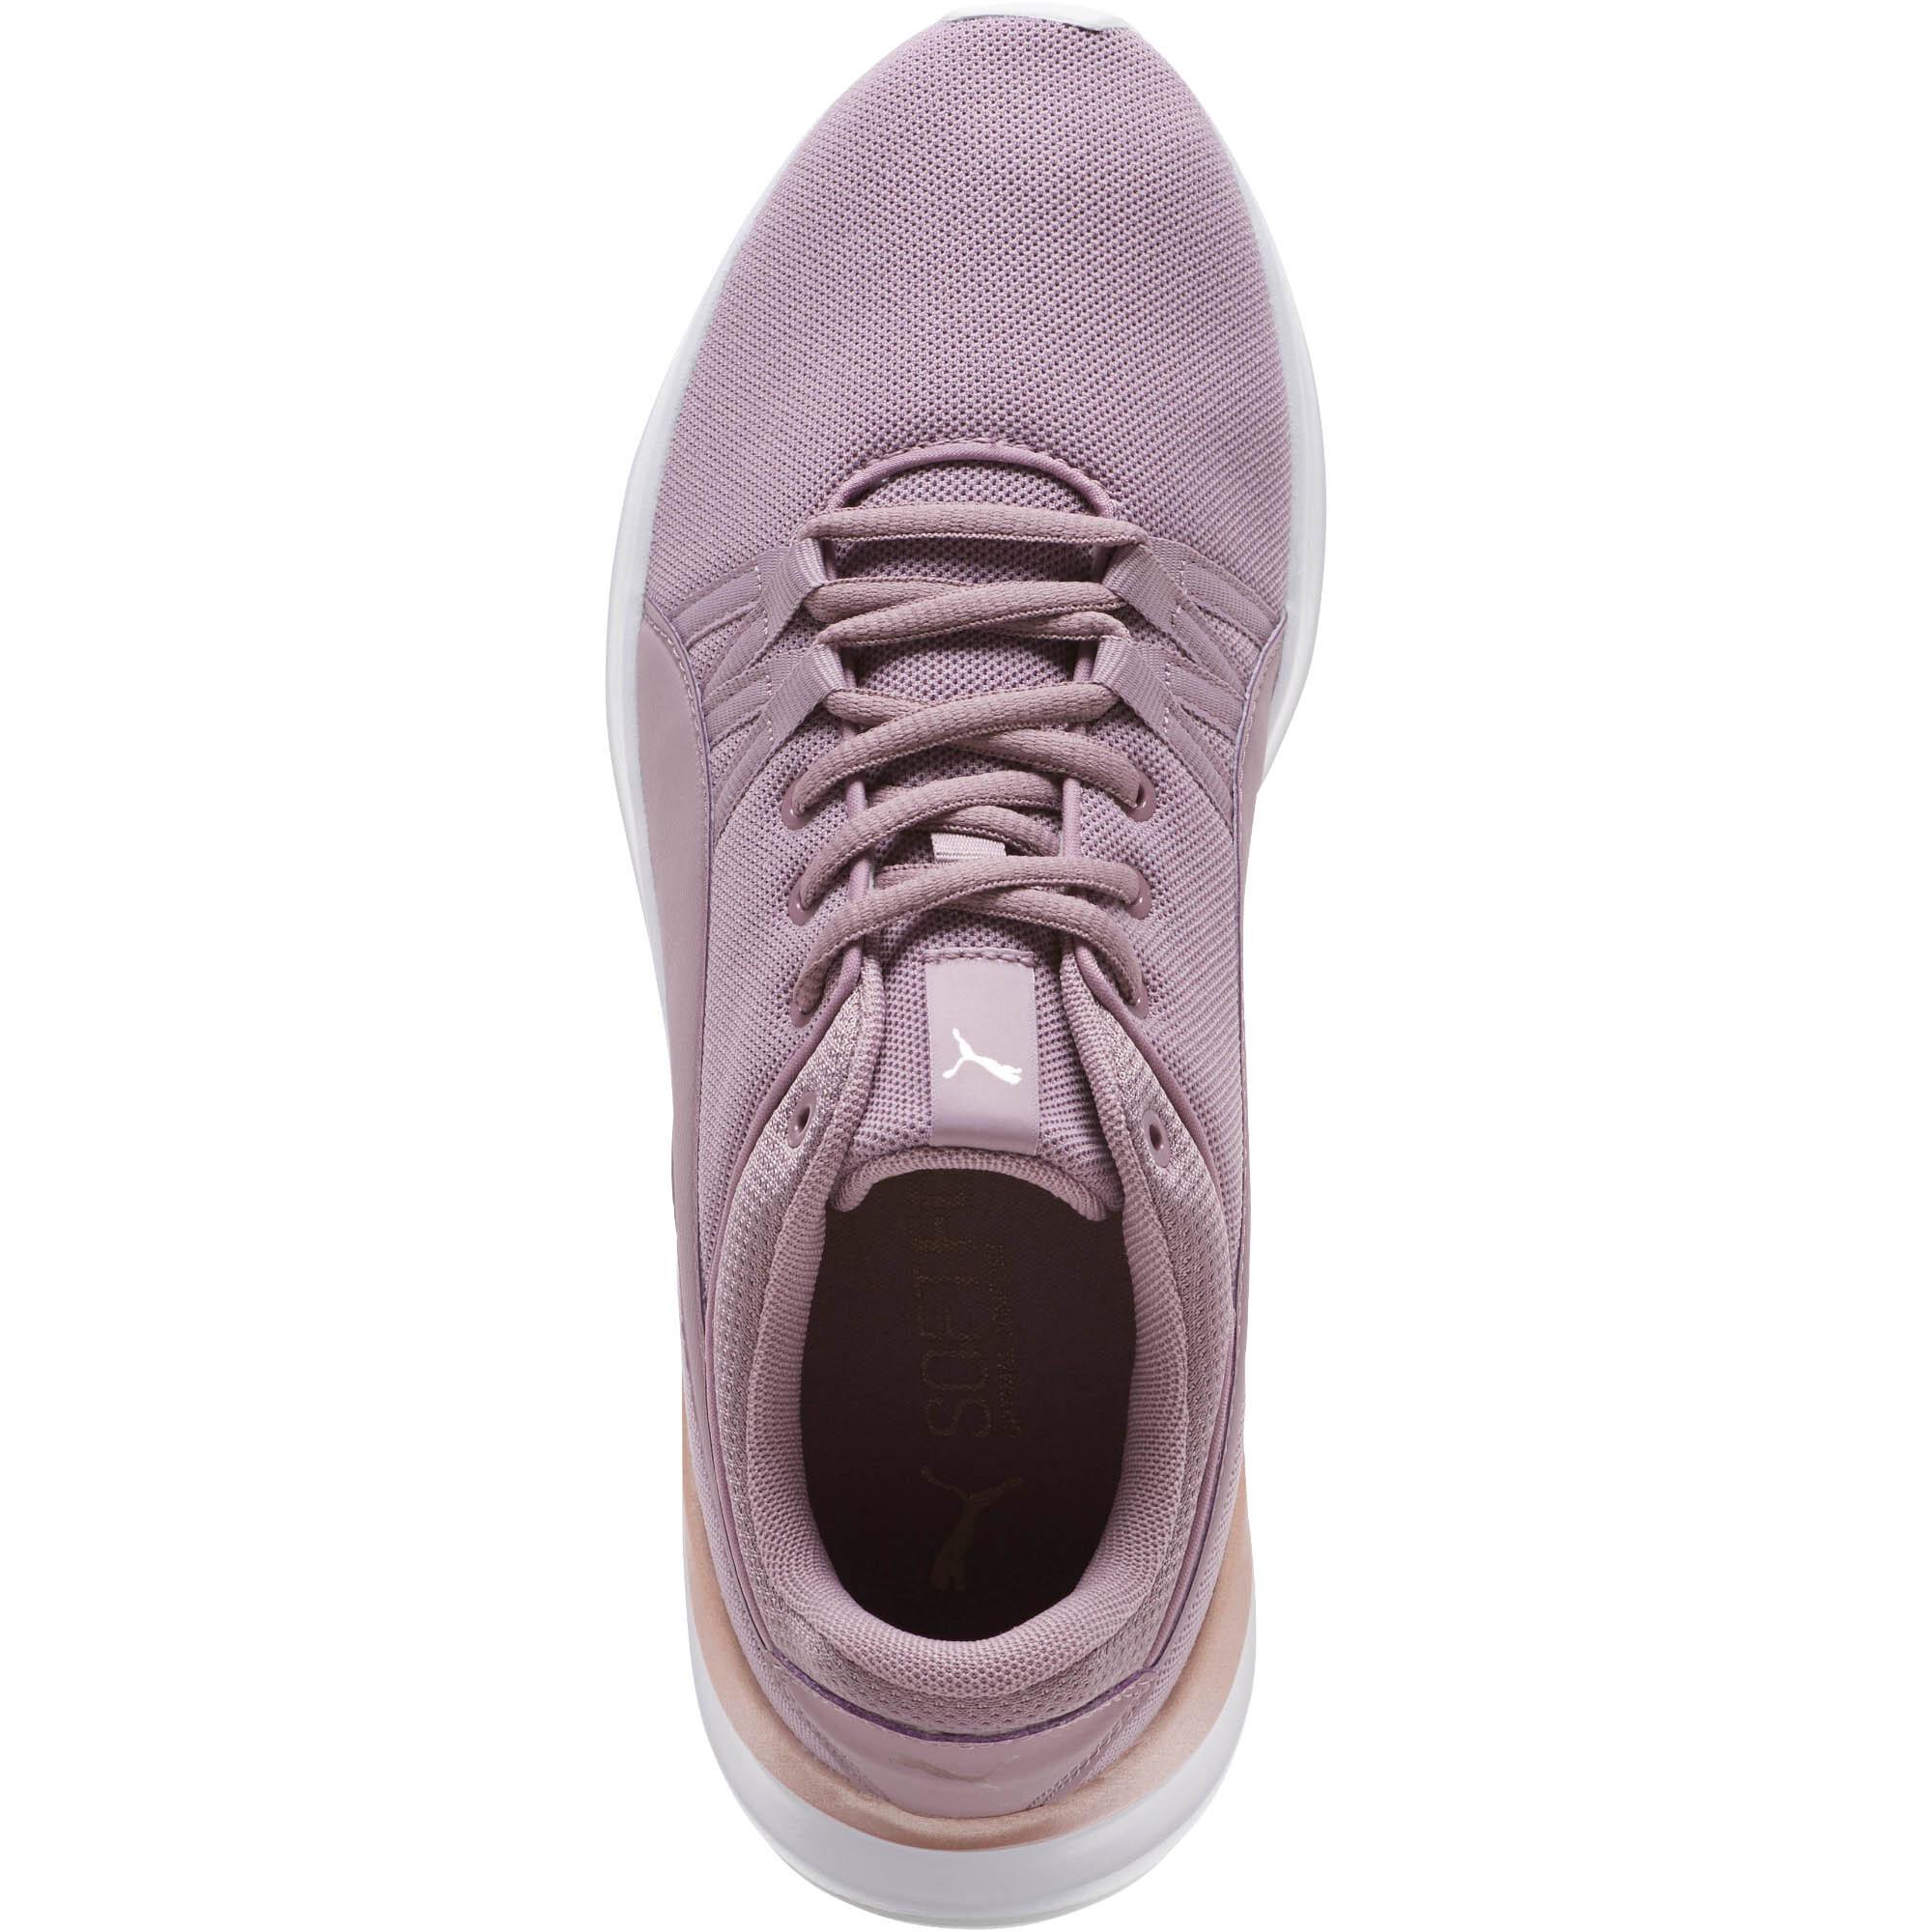 PUMA-Adela-Mesh-Women-s-Sneakers-Women-Shoe-Basics thumbnail 6